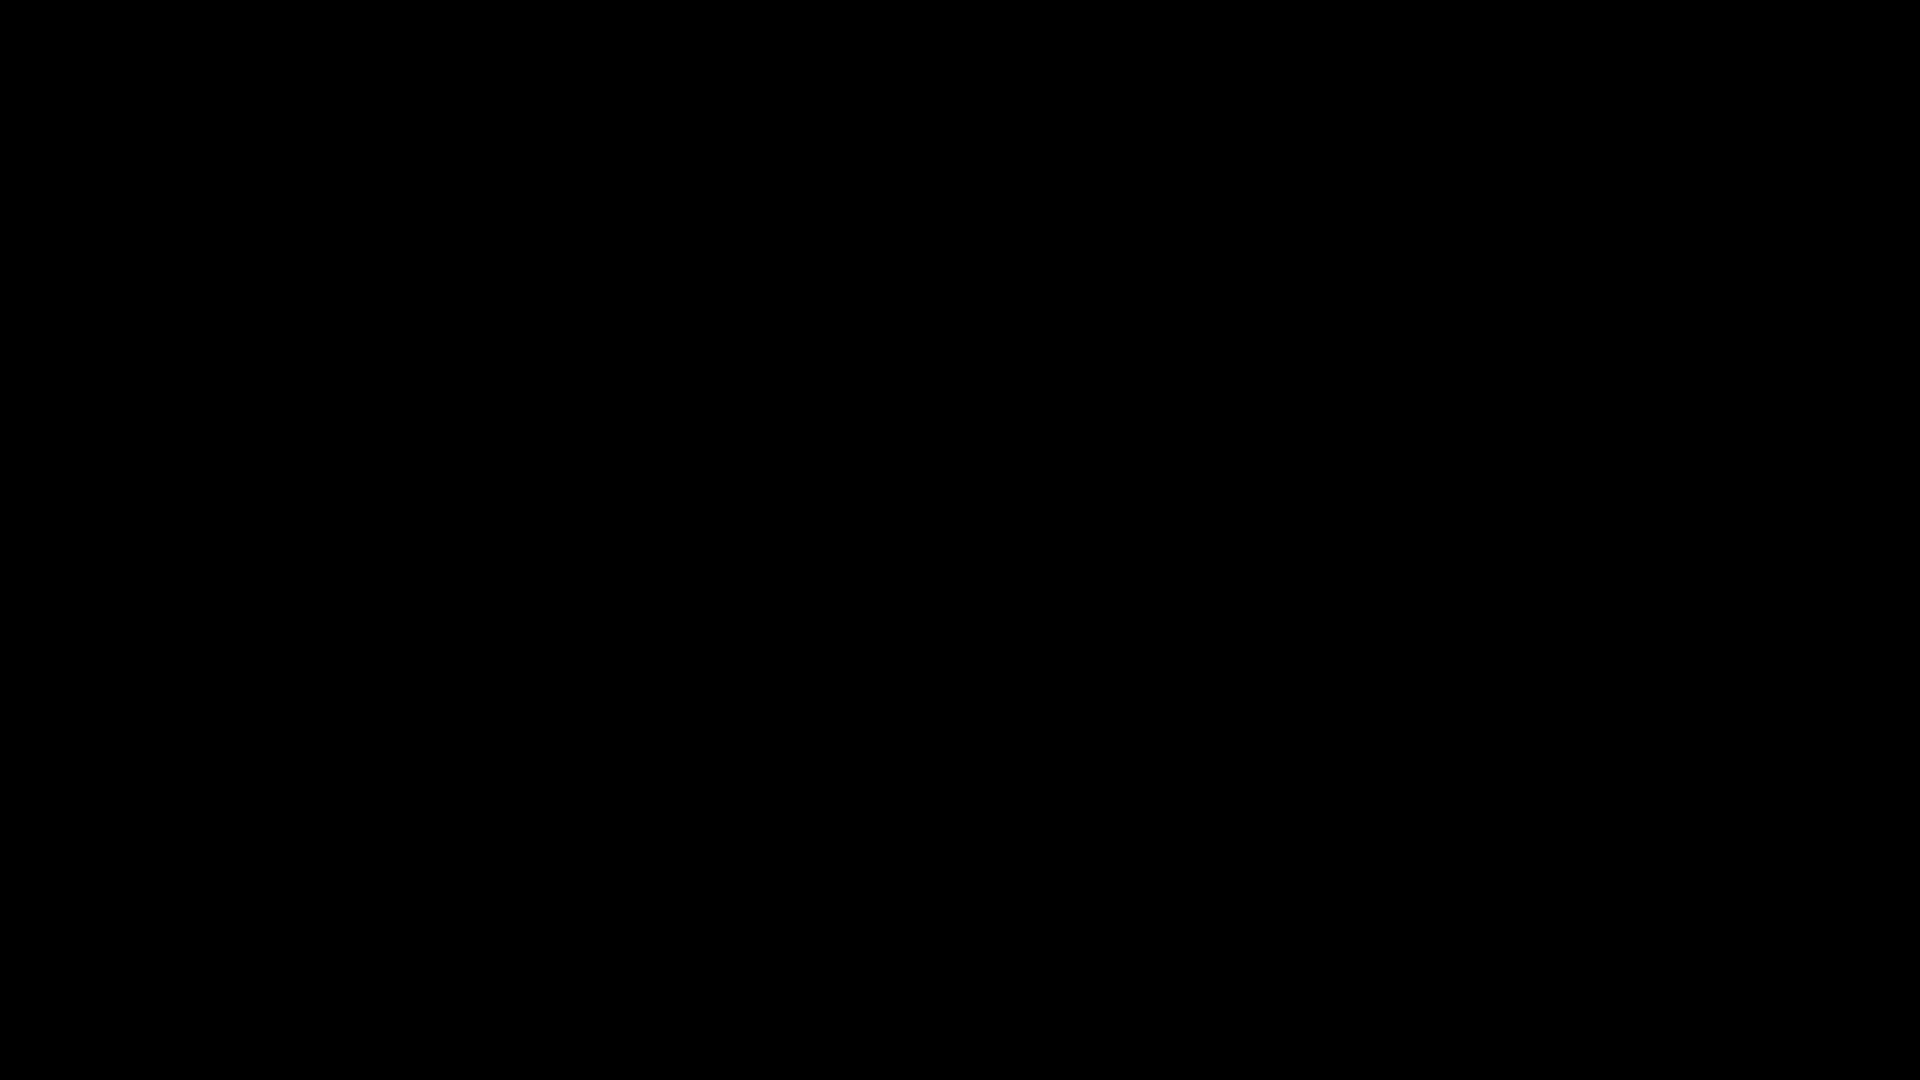 高画質露天女風呂観察 vol.032 女風呂 | OLのエロ生活  101連発 8